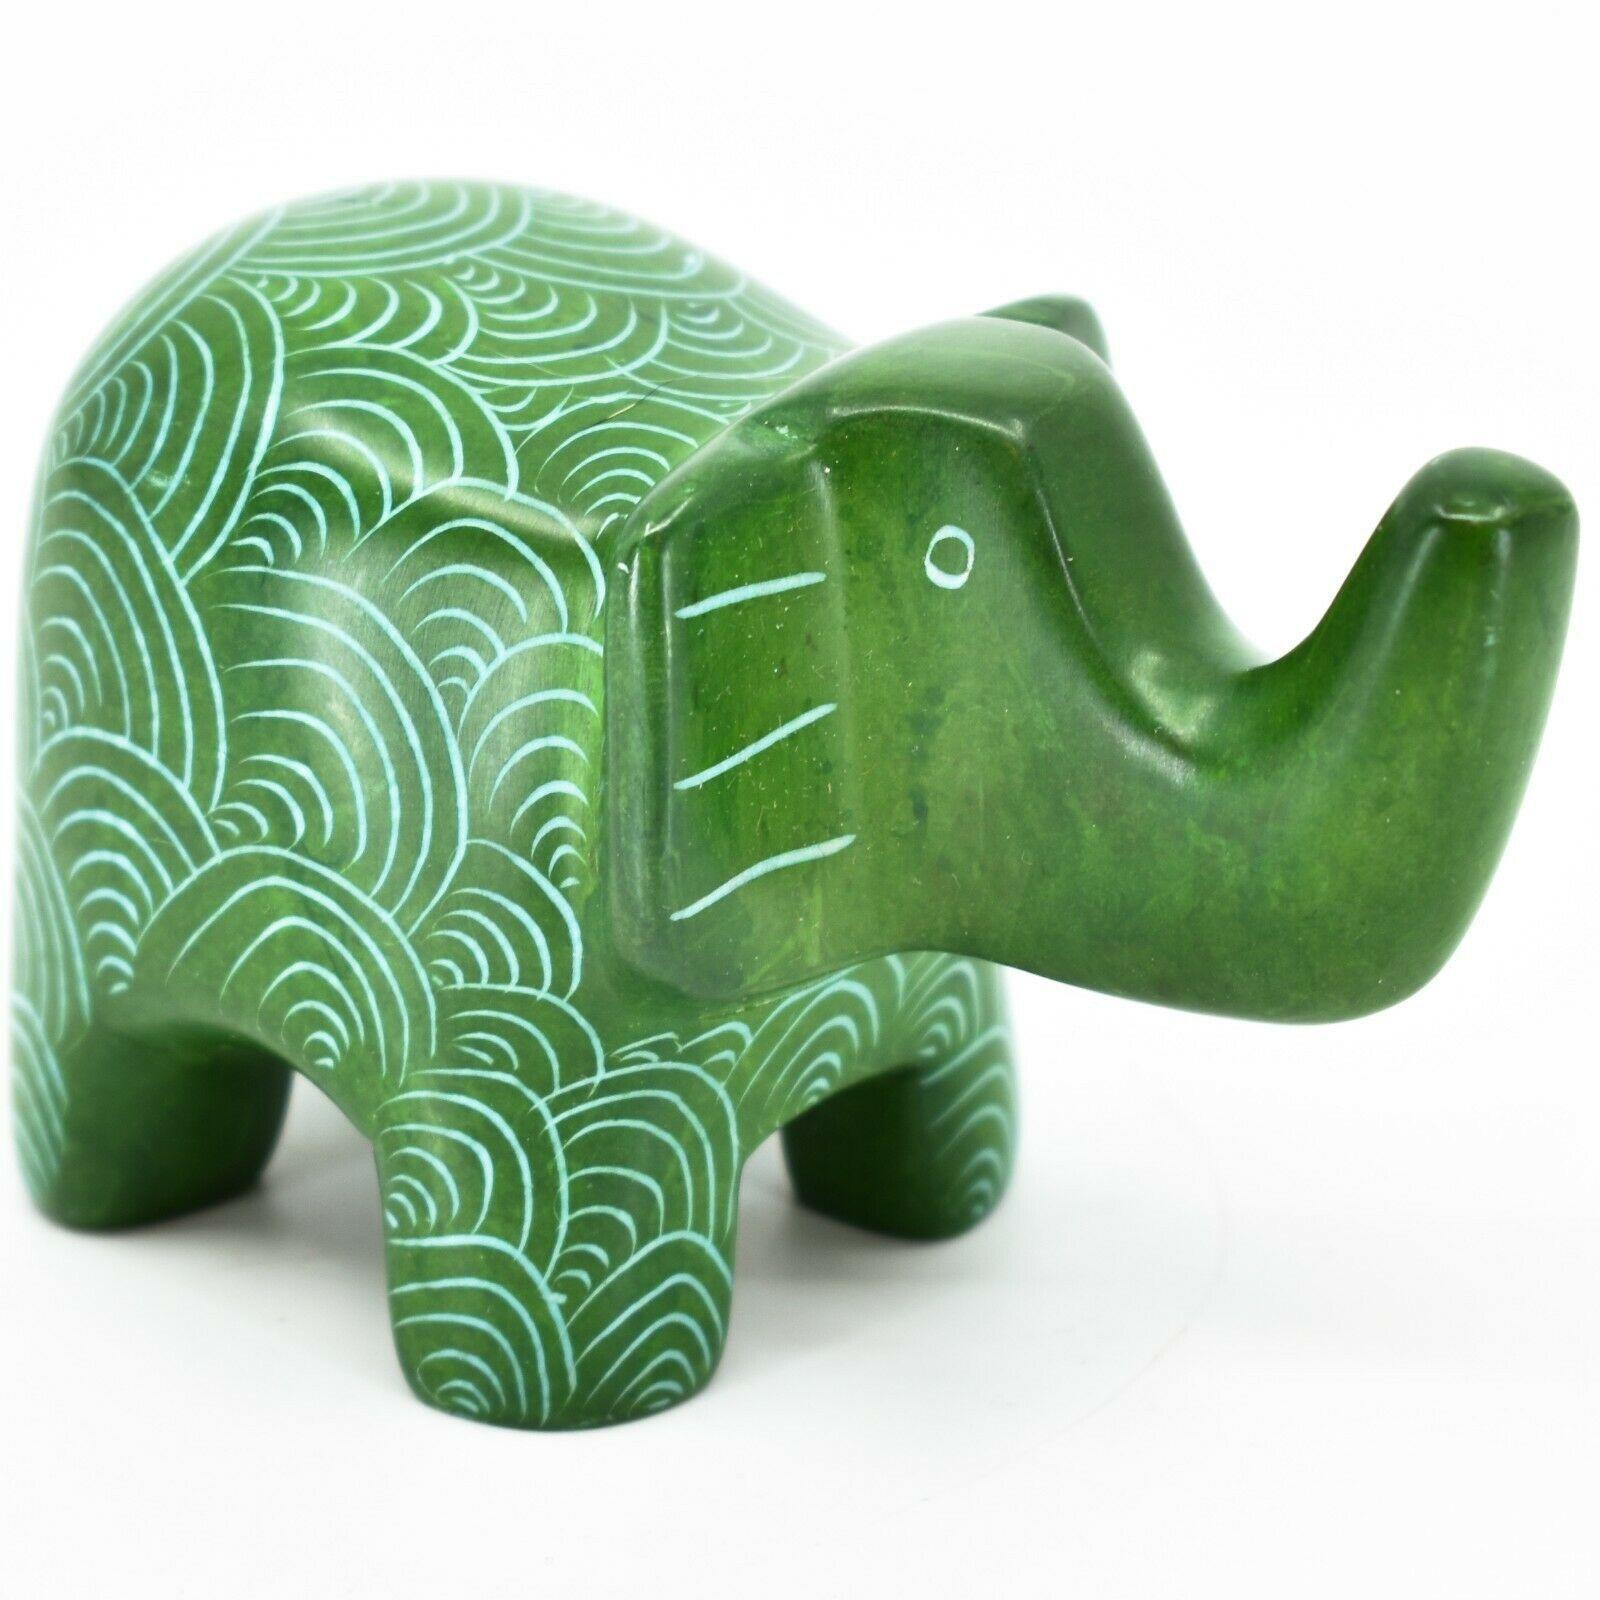 Vaneal Group Hand Crafted Kisii Soapstone Green Elephant Figurine Made in Kenya